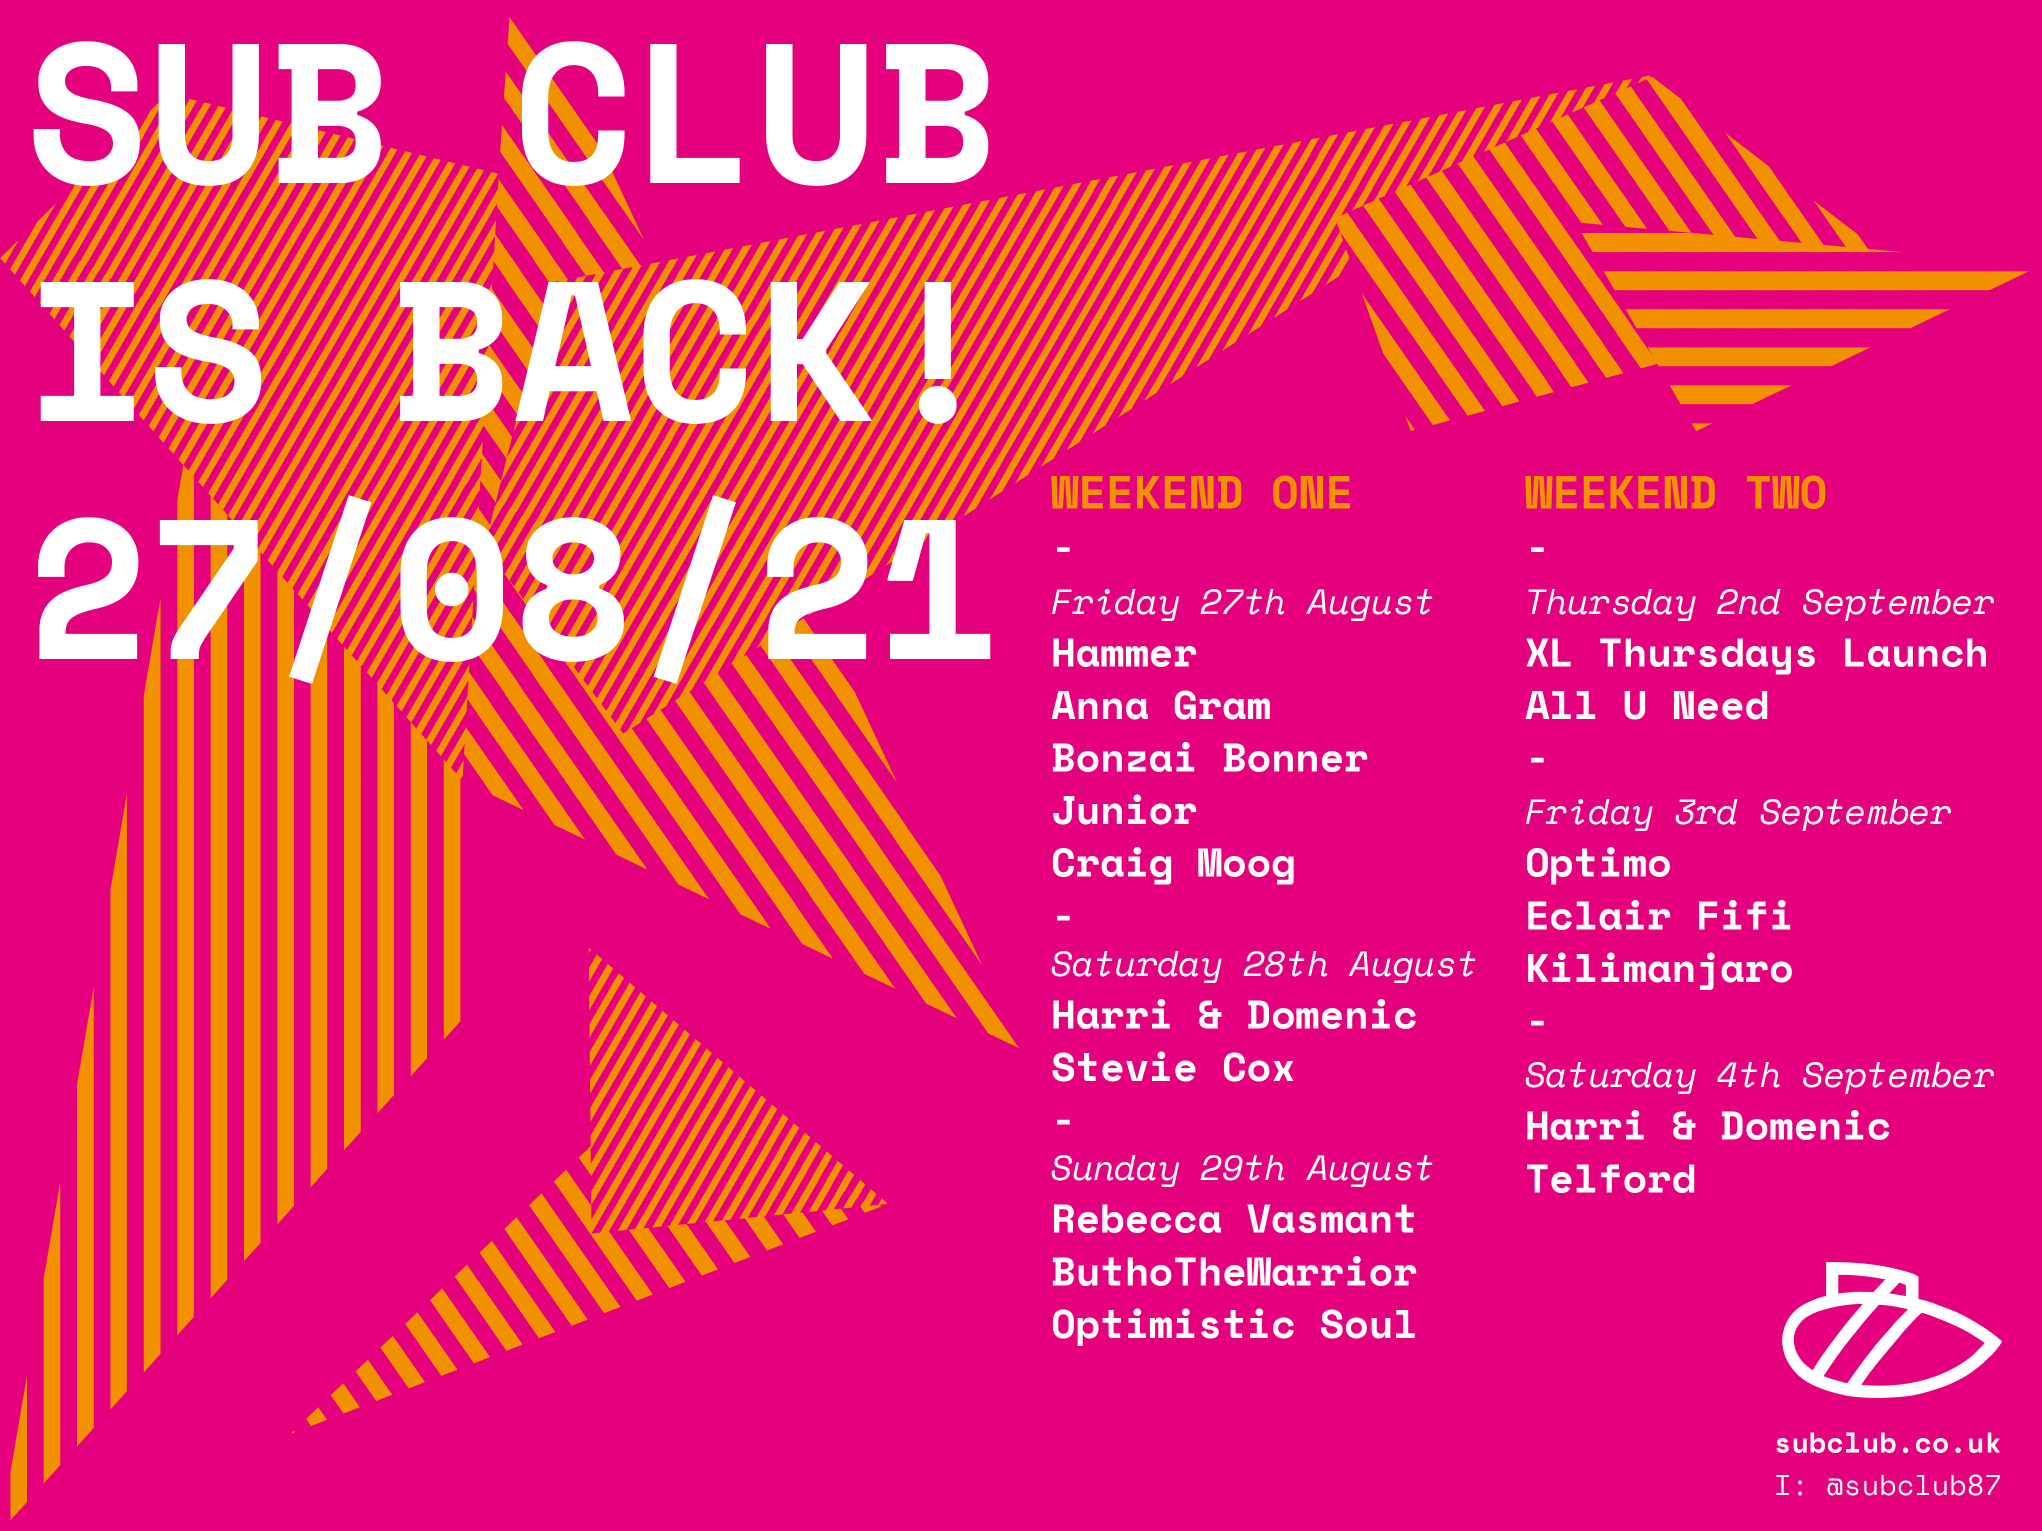 Sub Club reopening!